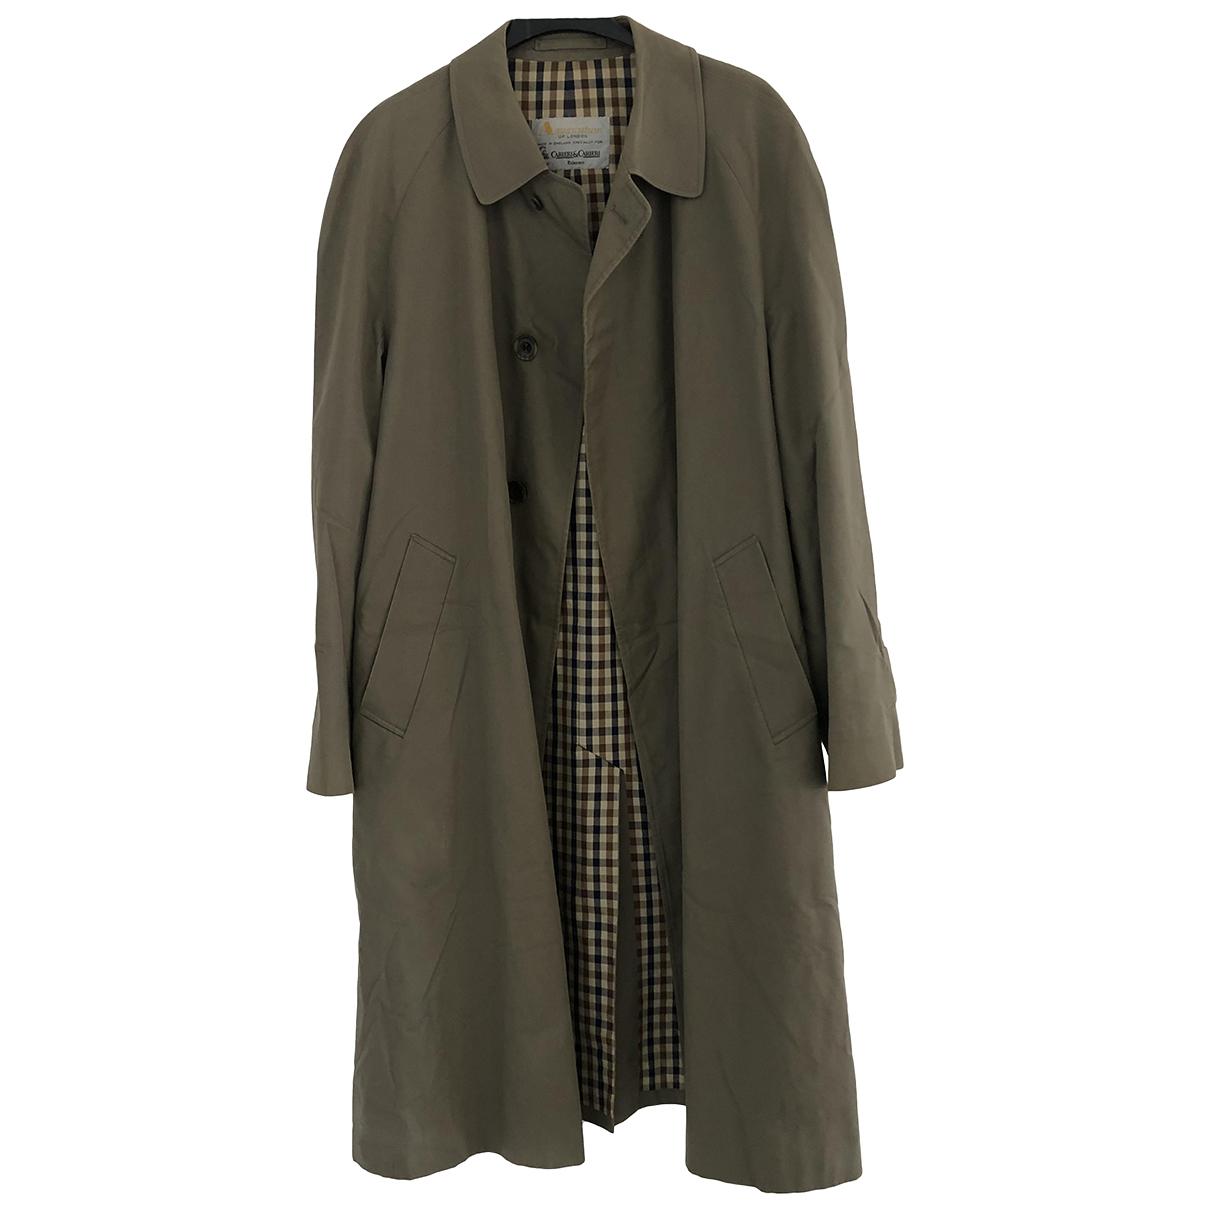 Aquascutum N Beige Cotton coat  for Men 42 UK - US